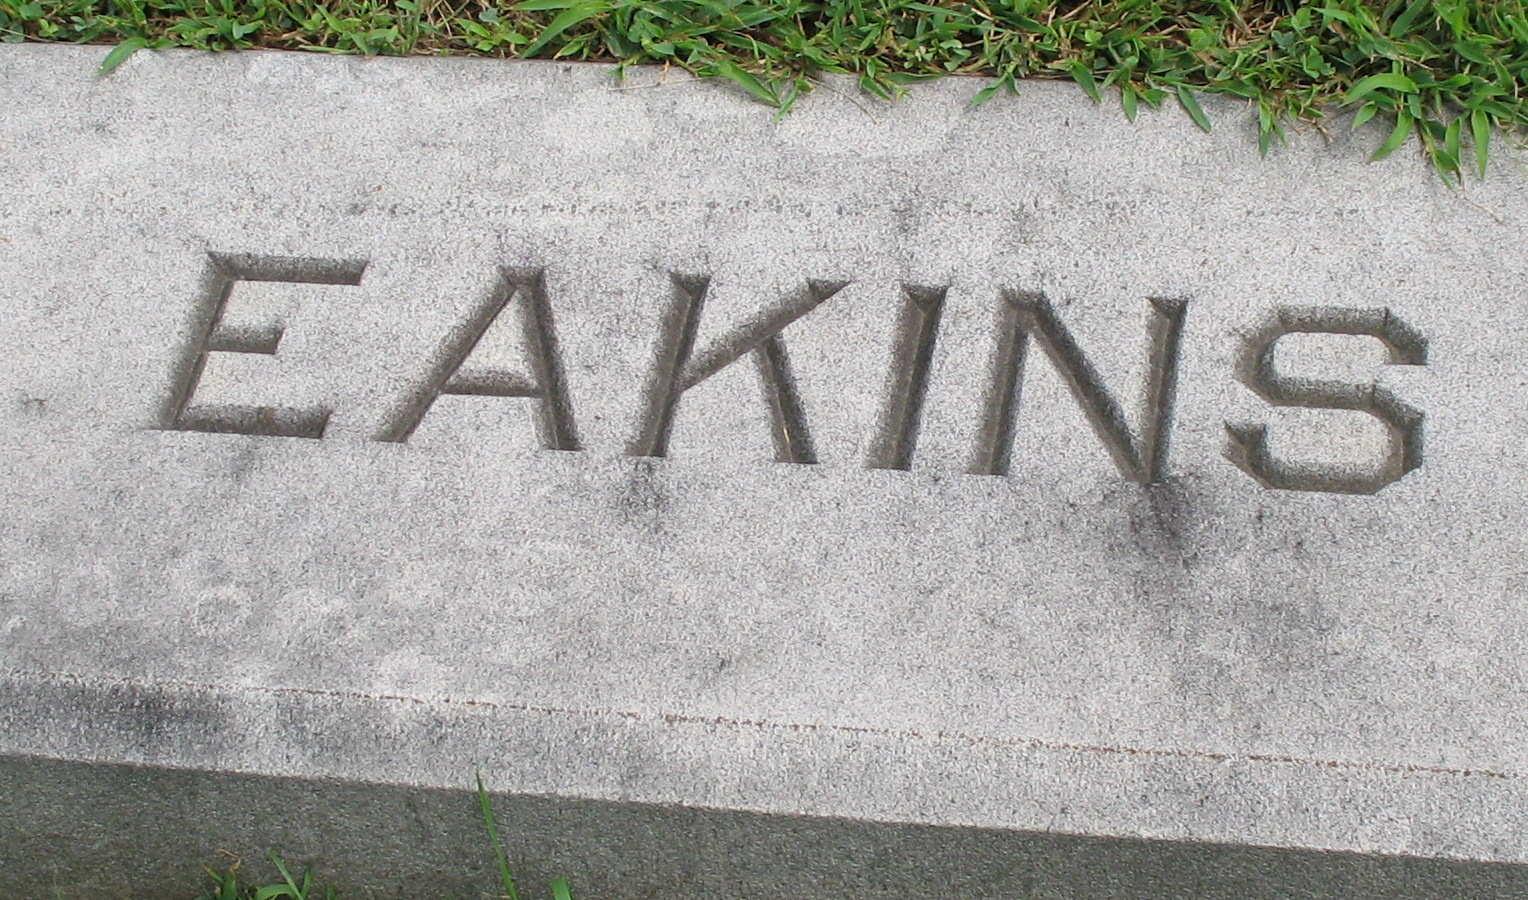 John Eakins